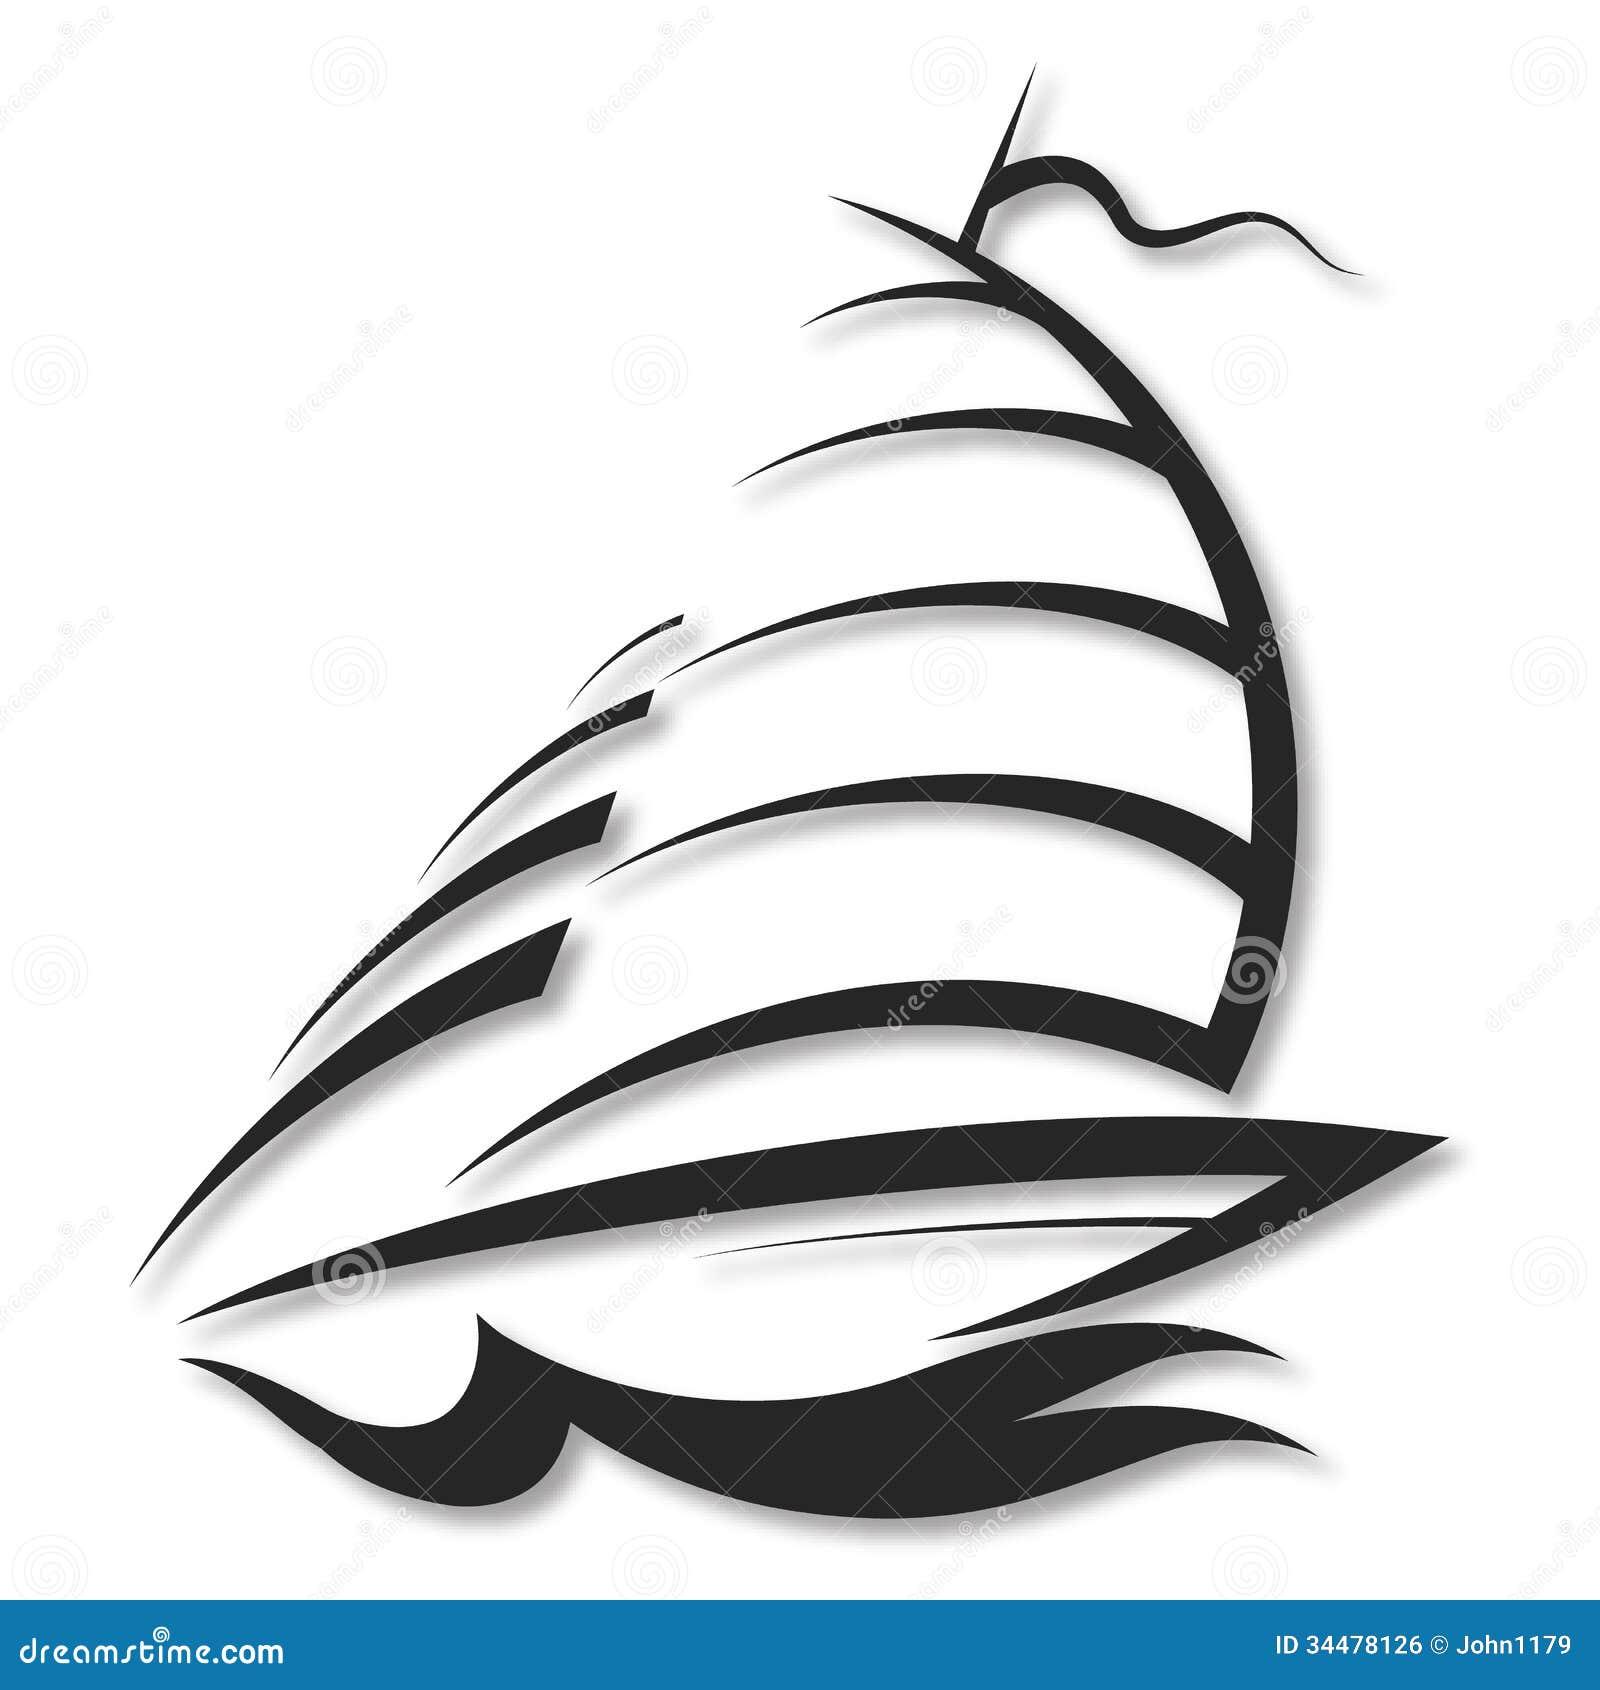 Design Yacht Royalty Free Stock Image - Image: 34478126